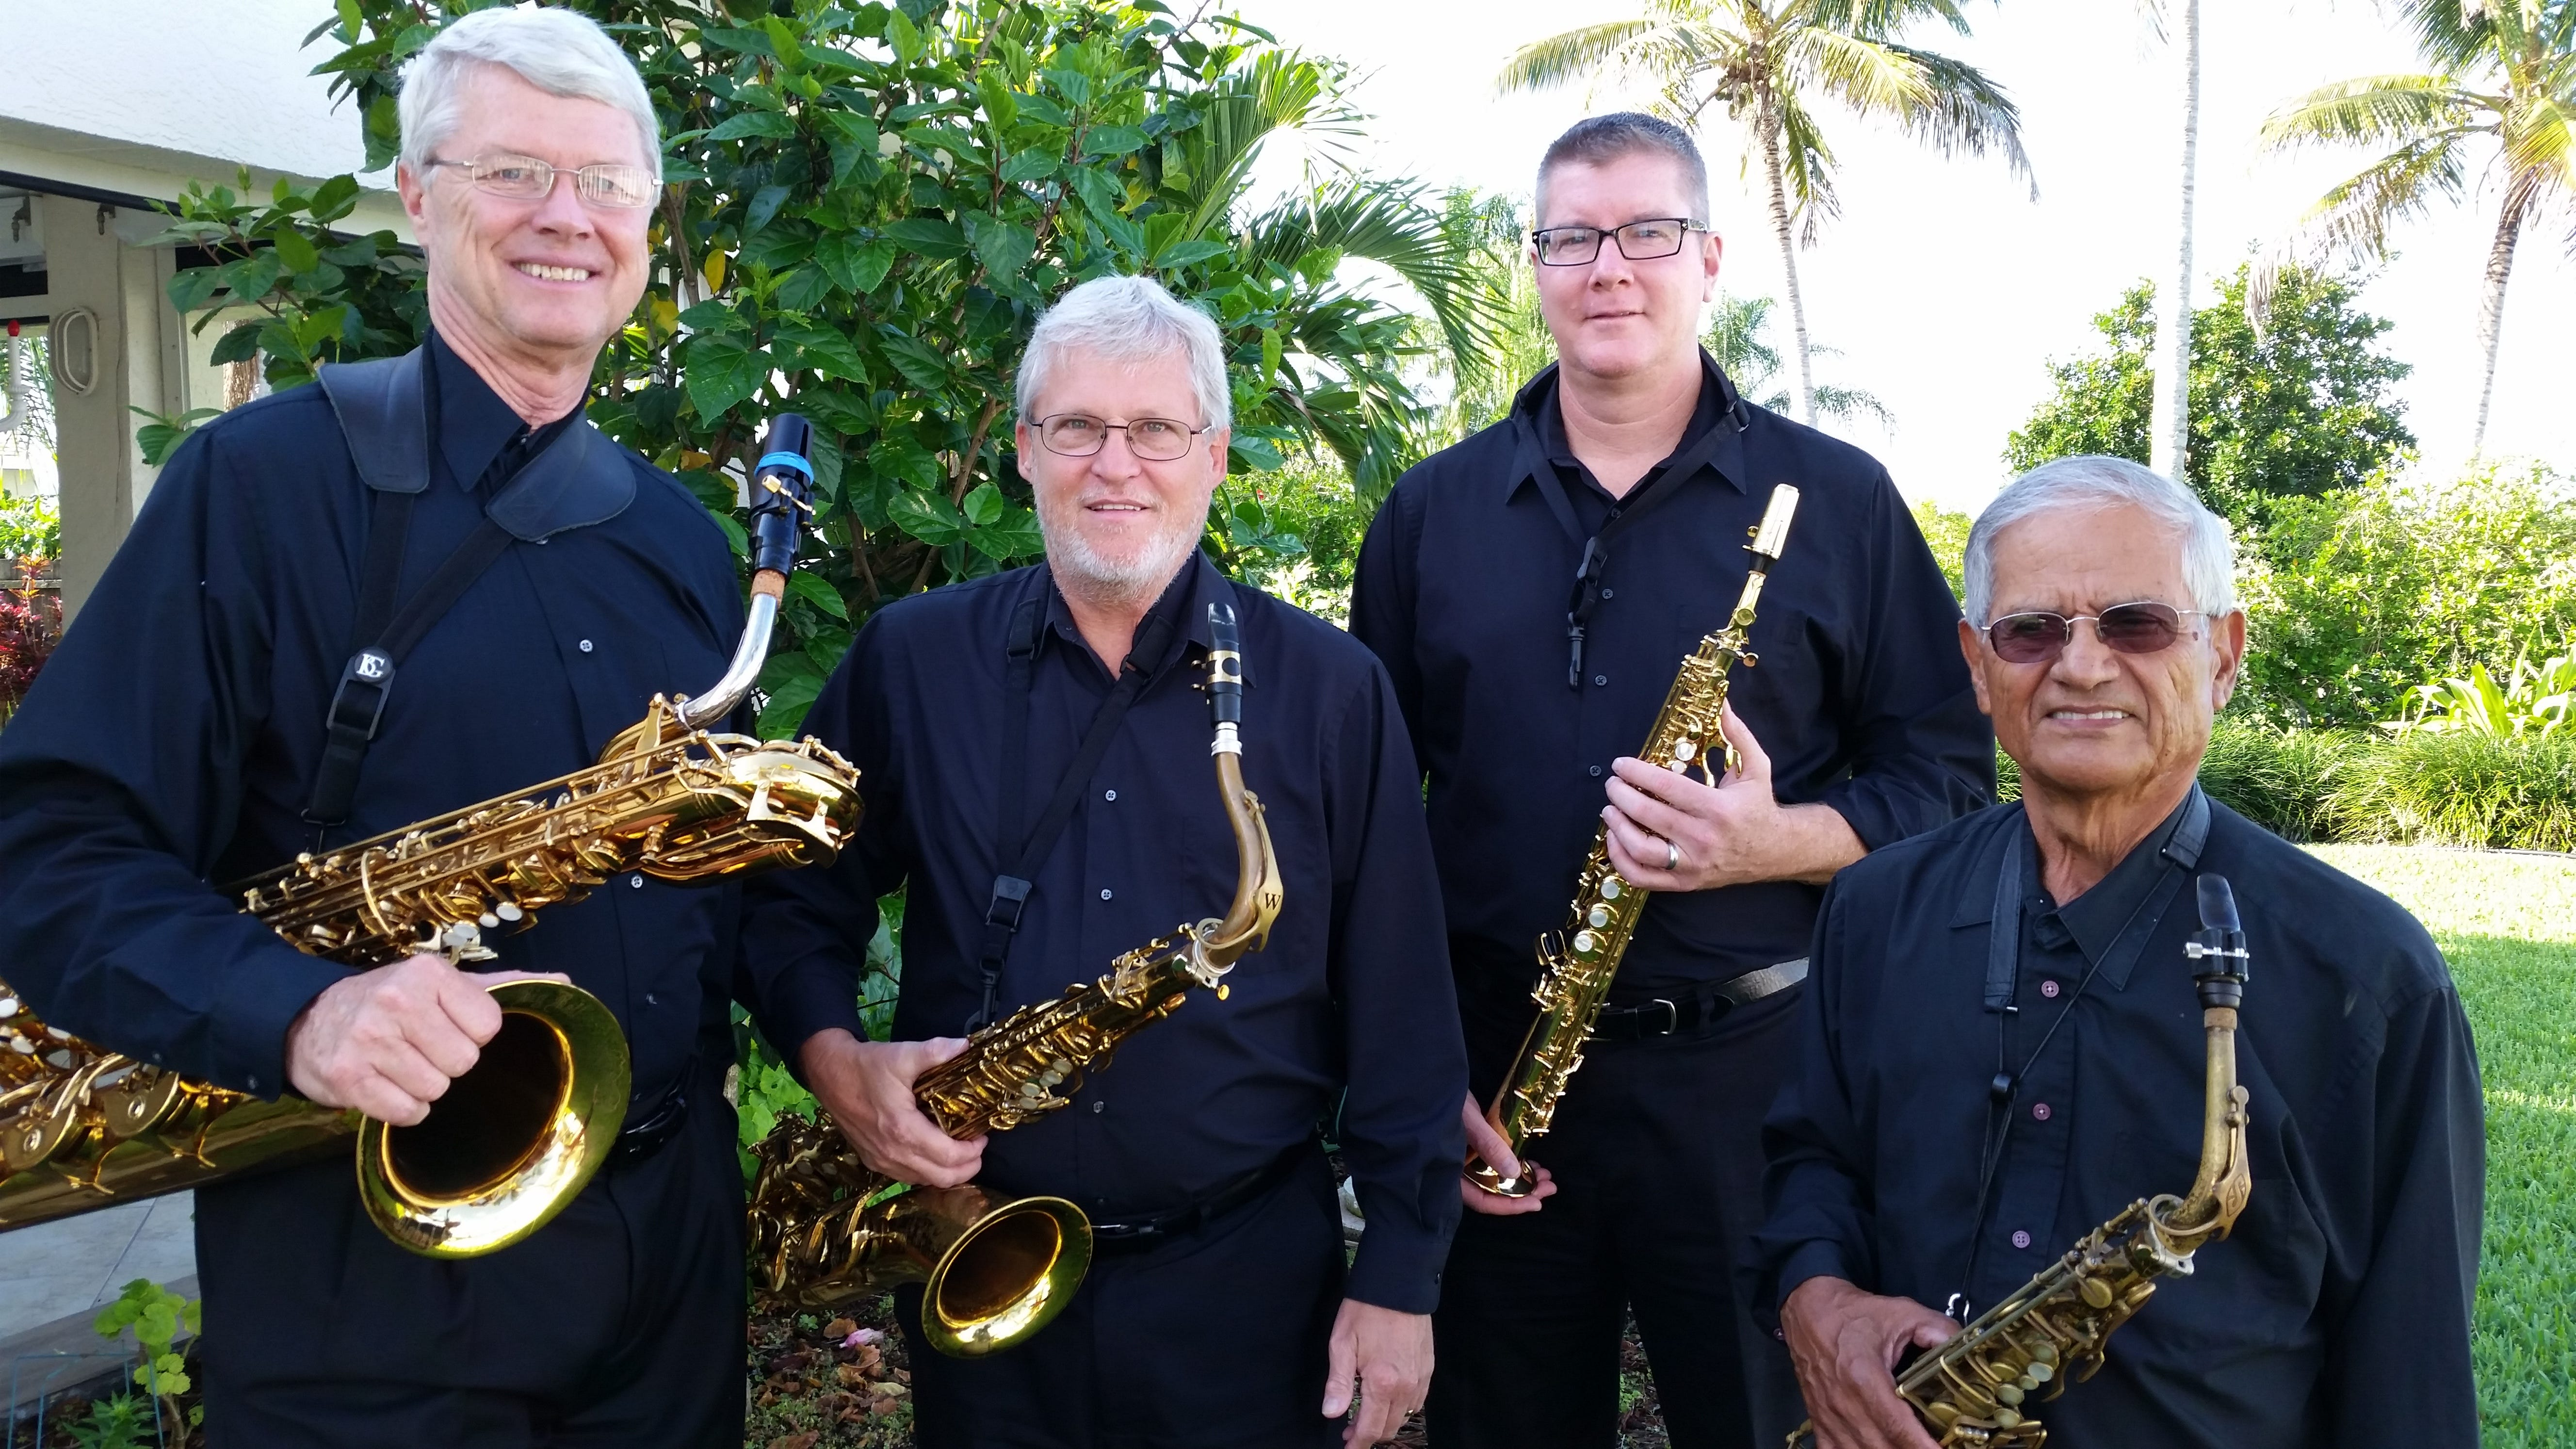 The boys of the Adagio Sax Quartet, (from...